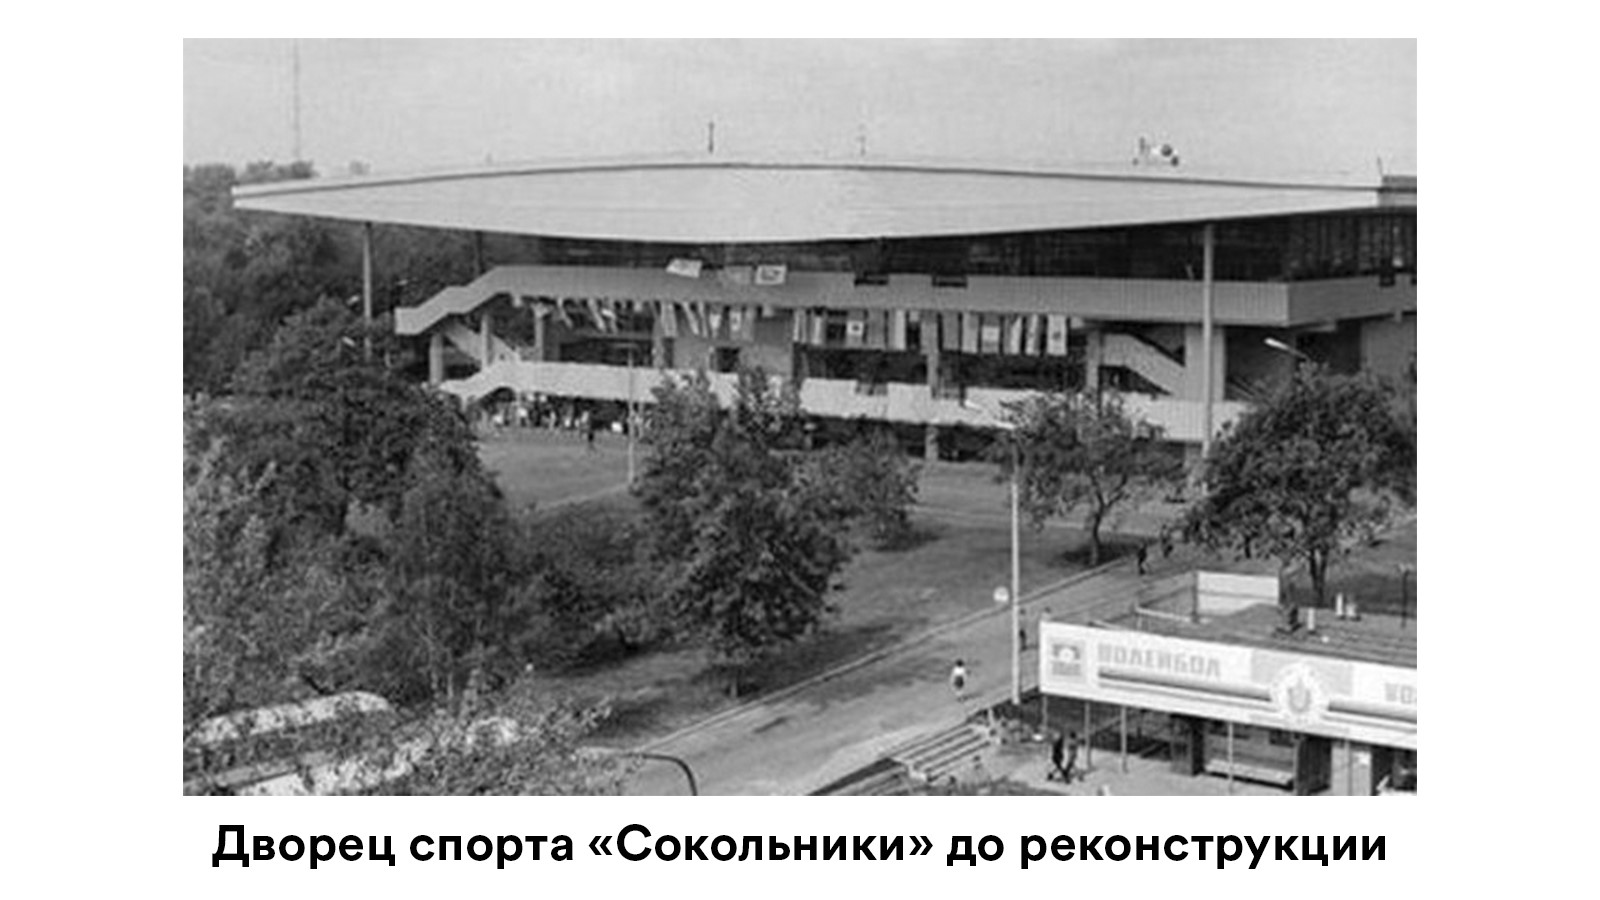 После давки 1975-го дворец спорта перестроили